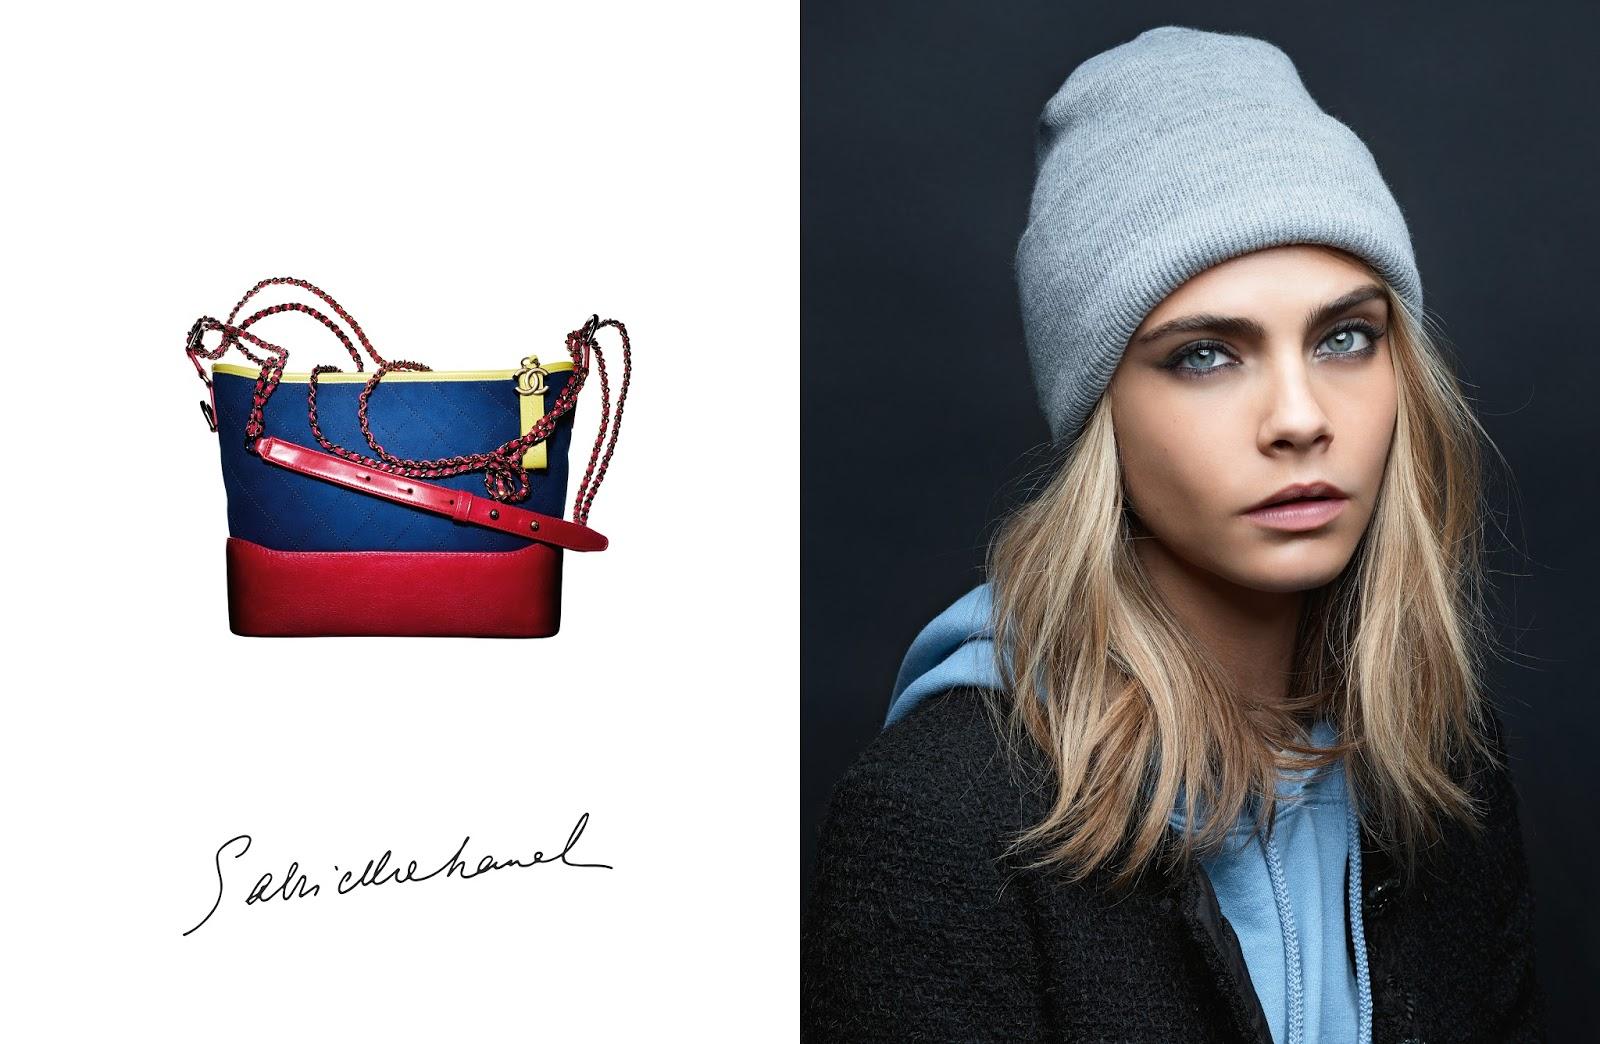 BTS Video: Cara Delevingne's Chanel Gabrielle Bag Campaign Film